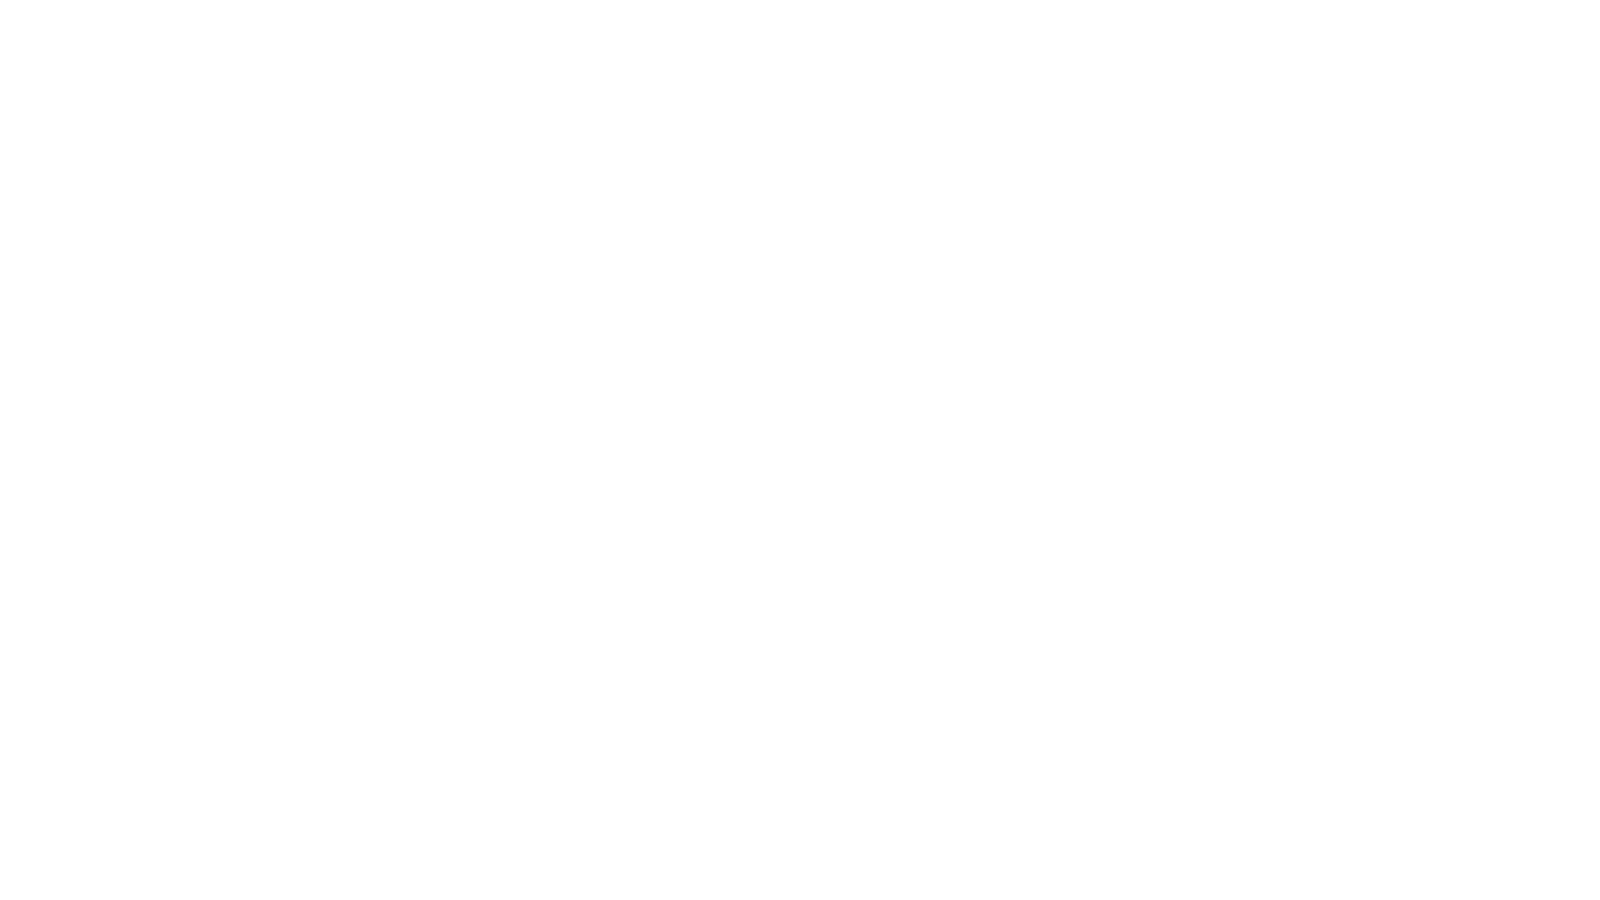 Christ the Savior Orthodox Cathedral in Toronto, Ontario, Canada 823 Manning Ave, Toronto, ON M6G 2W7  You can support our cathedral by making an e-transfer to treasurer@sobortoronto.com  Website: http://sobortoronto.com Facebook:  https://www.facebook.com/christthesaviourtoronto Instagram:  https://www.instagram.com/sobor_toronto/ YouTube:   https://www.youtube.com/user/sobortoronto/ --- Священники Собора   Clergy:  Настоятель, протоиерей Василий Колега   V. Rev. Vasyl Kolega (416) 522-5237 fr.vkolega@gmail.com  Протоиерей Иоанн Шандра   V. Rev. Ivan Shandra (647) 859-9119 fr.johnshandra@gmail.com  Иерей Иоанн Симчина   Rev. Ivan Symchyna (647) 998-4743 symchynaivan@gmail.com